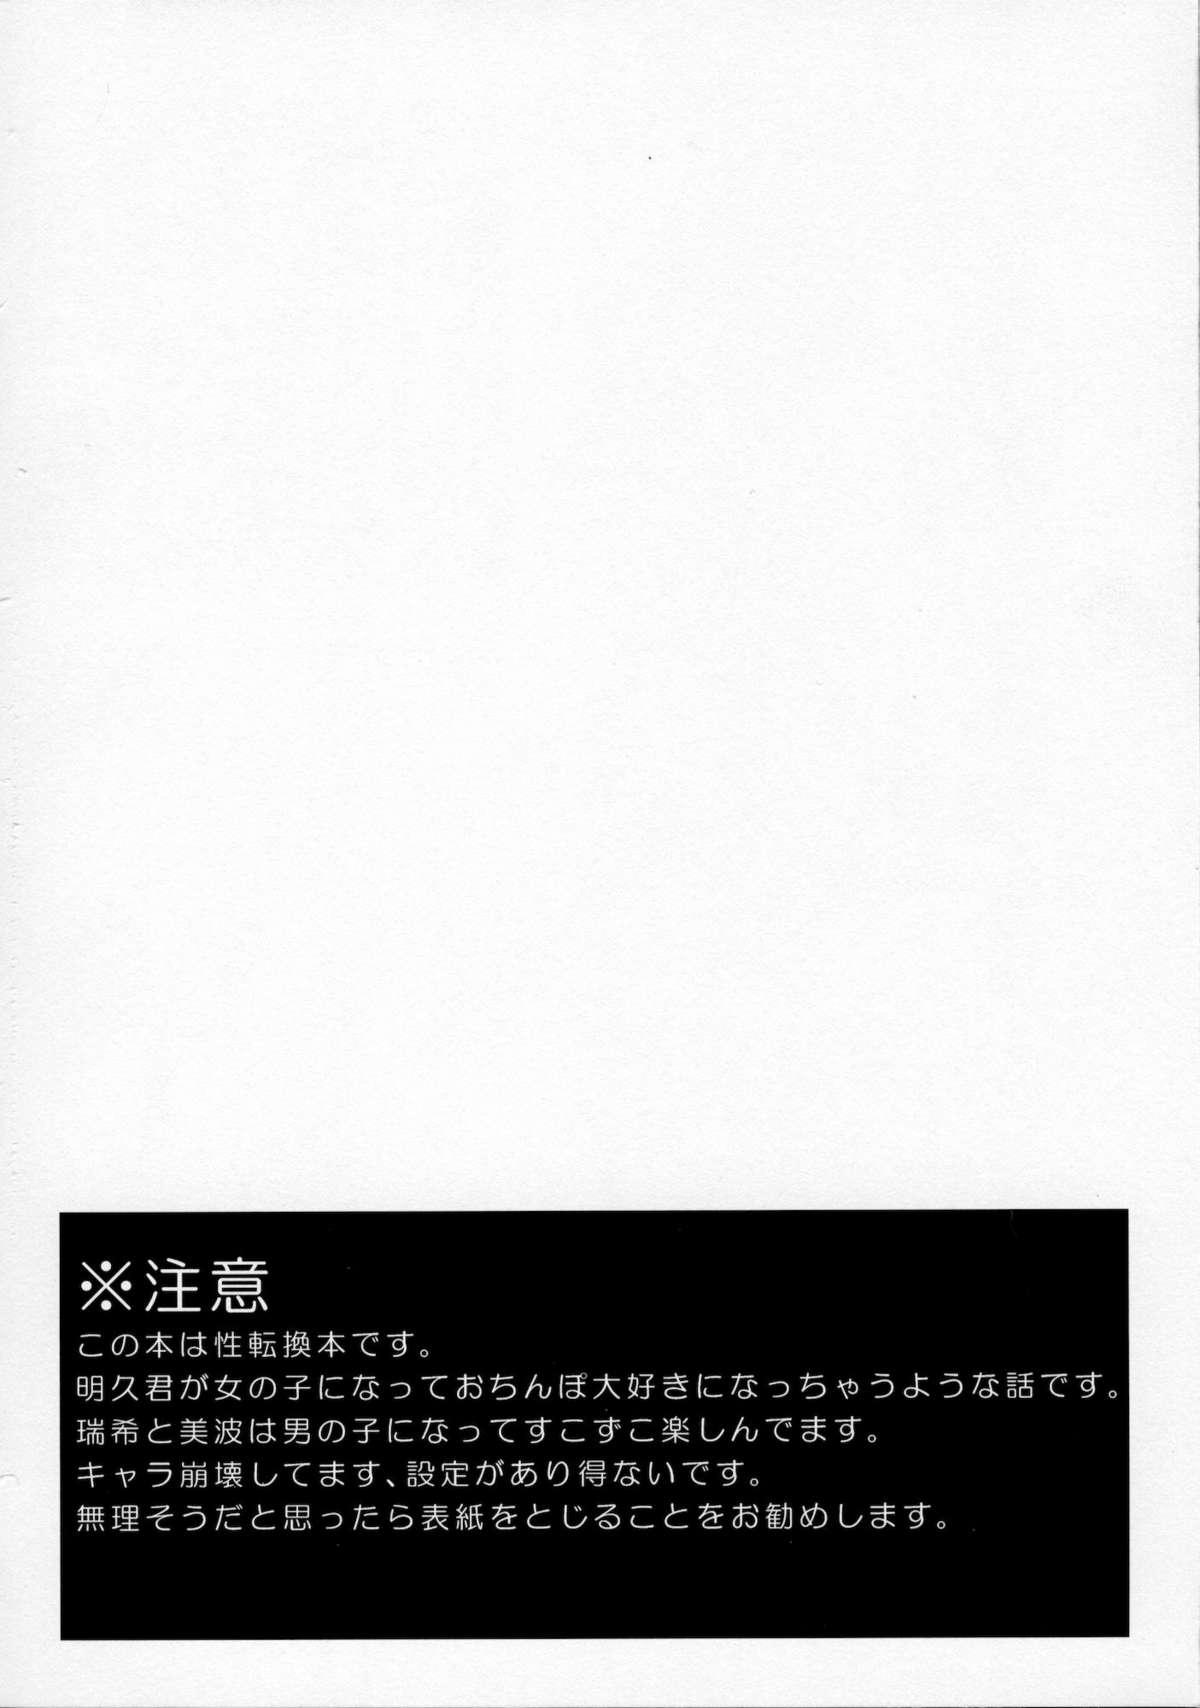 Onnanoko wa Kimochi Iinda yo 2